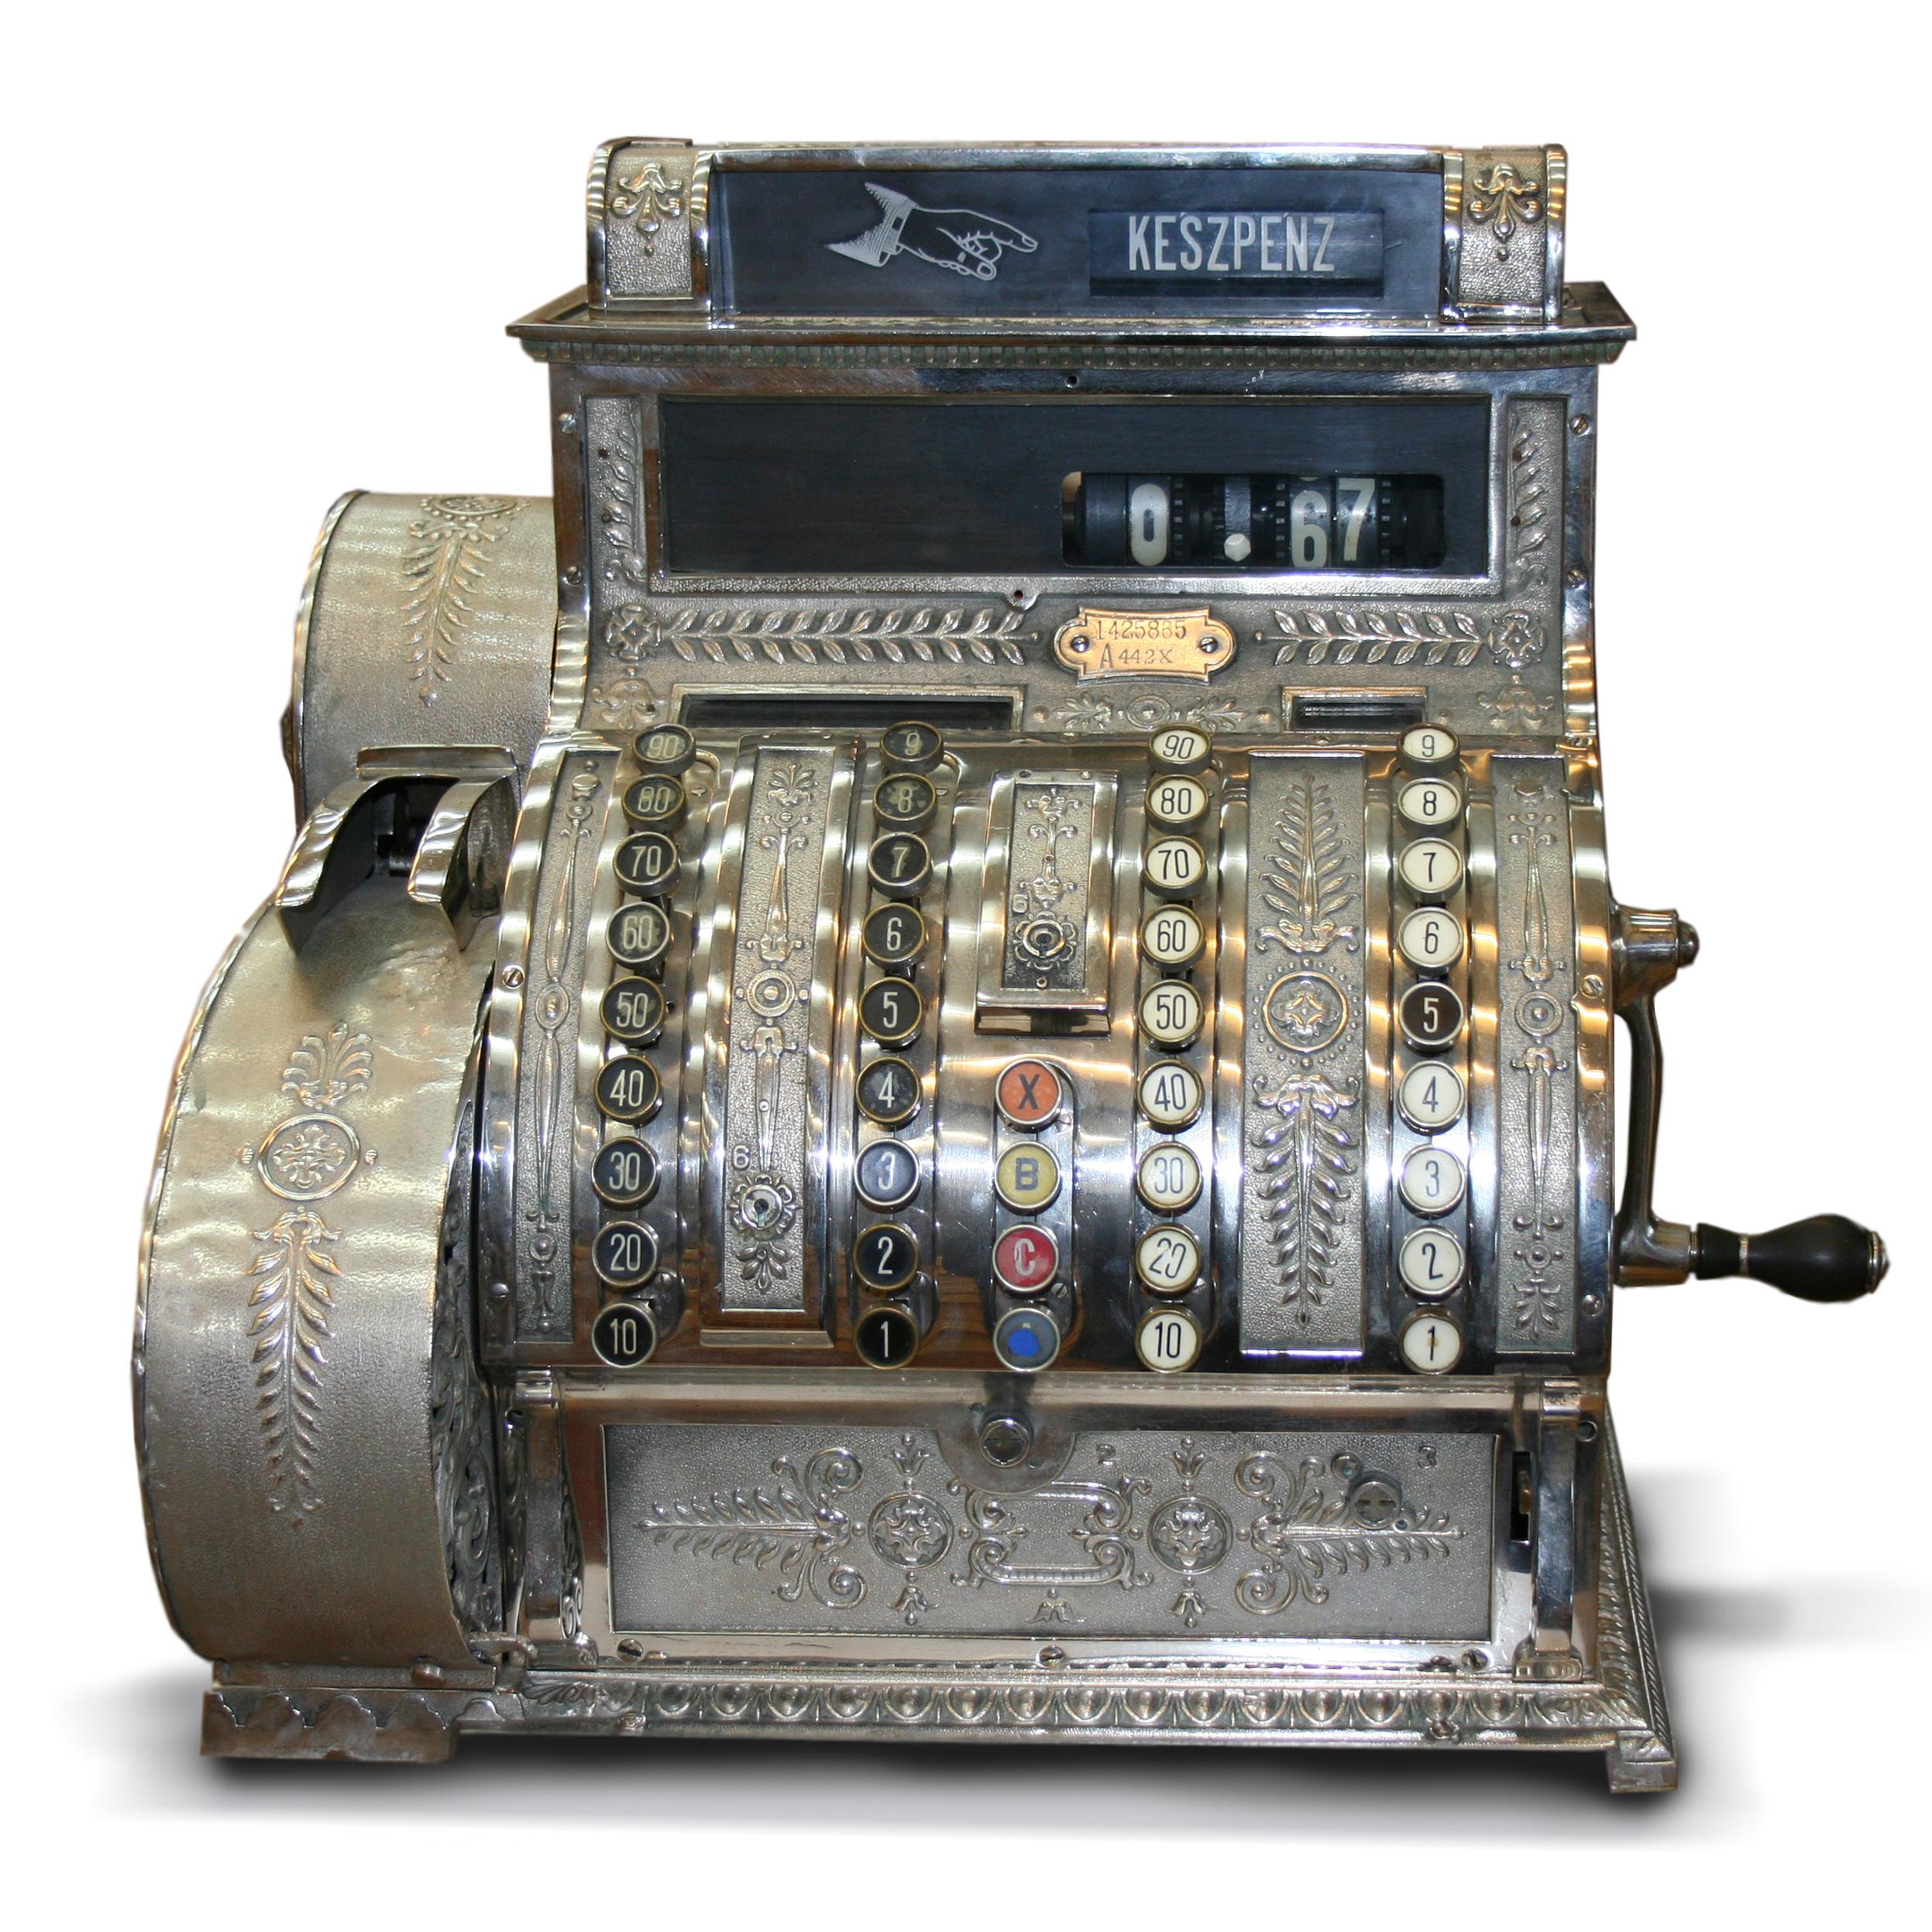 Favori File:Hungarian Antique three-column full-keyboard cash register  UF97